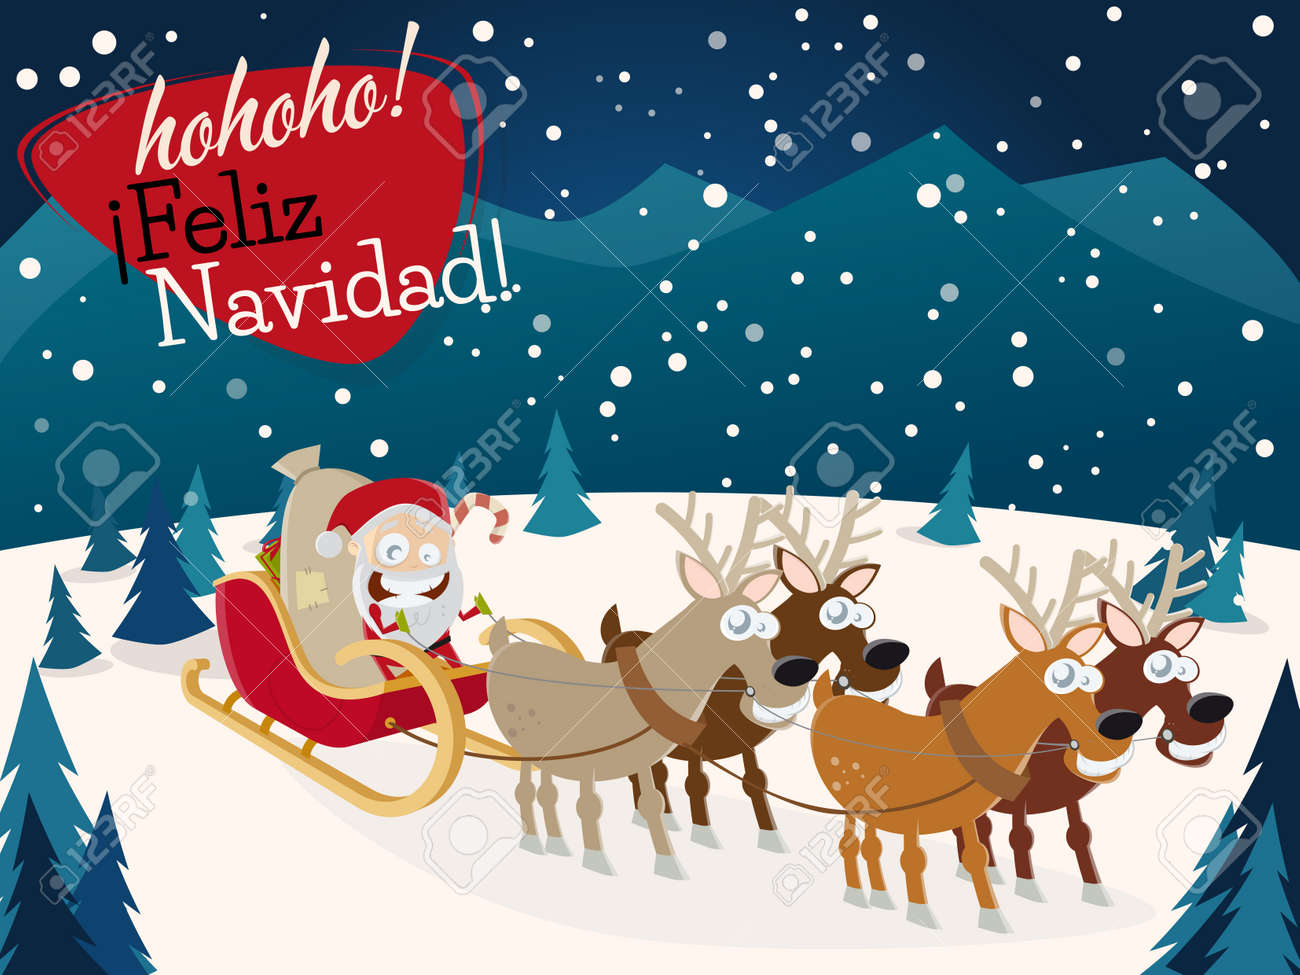 Christmas Wishes In Spanish.Spanish Christmas Greetings Feliz Navidad With Santa Claus And